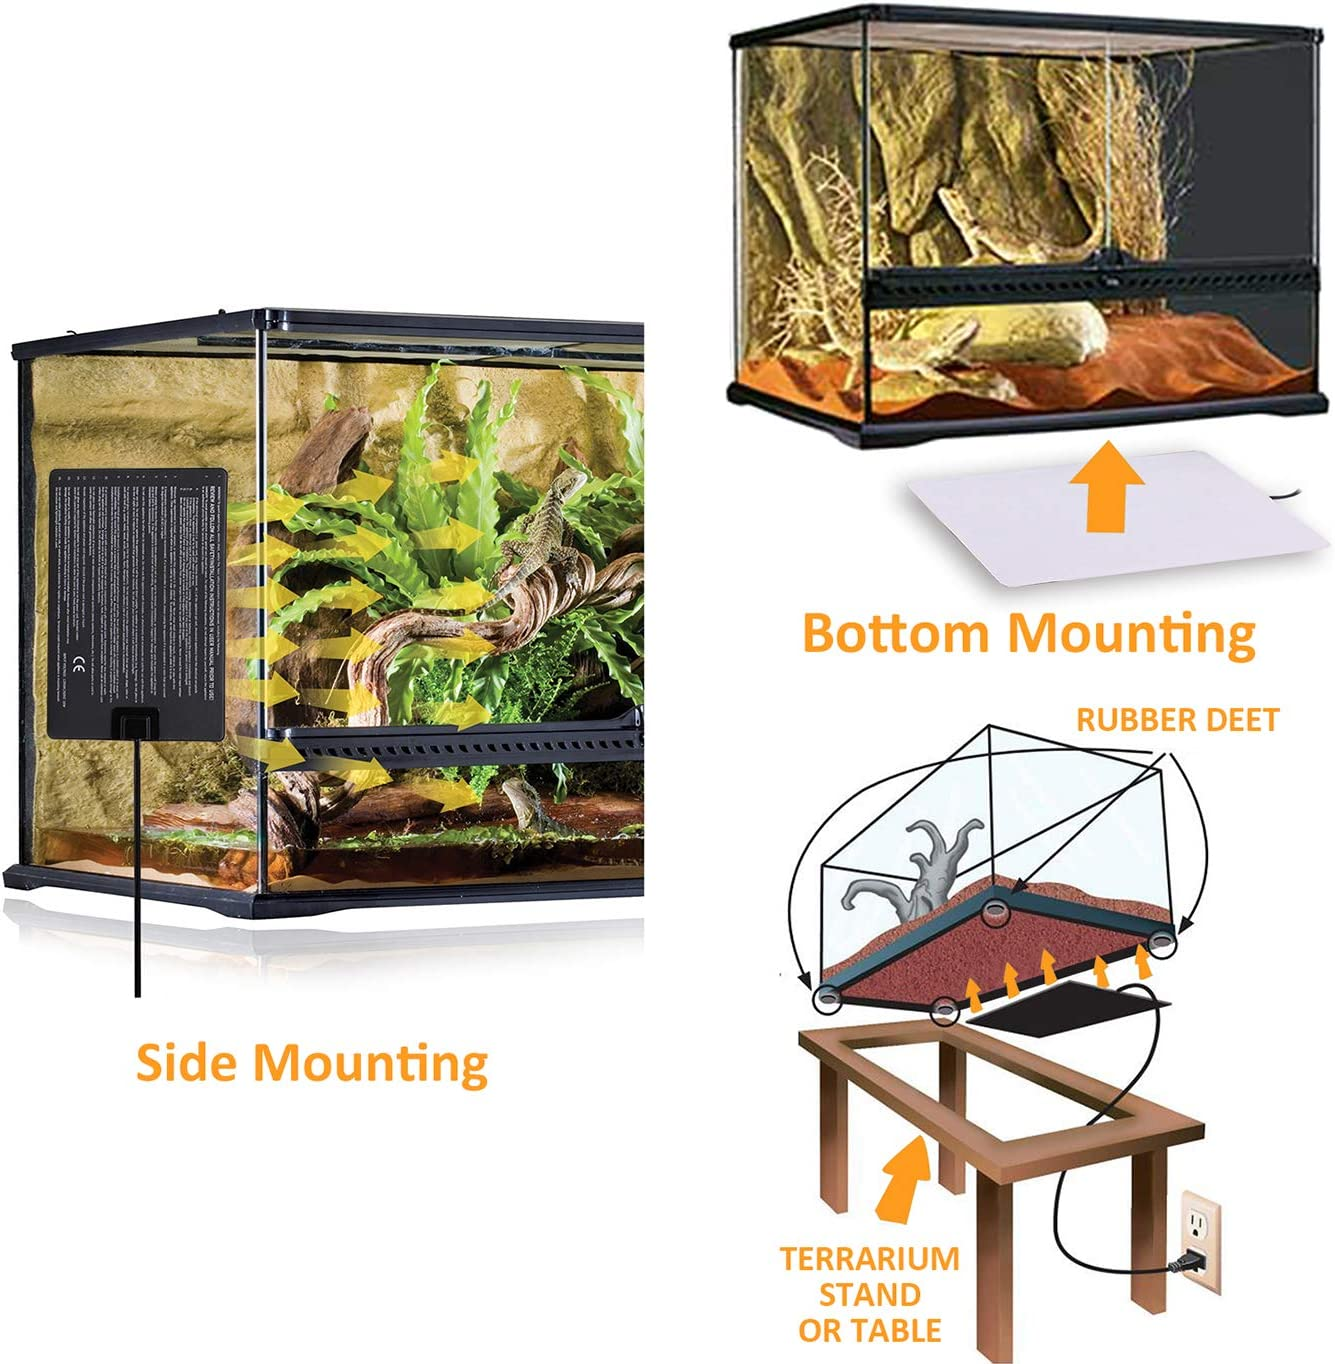 Terrarium Heat Pads Aquarium Heating Mat with Thermostat for Reptiles Snake 16W Turtles Lizard AIICIOO Reptile Heat Mat Tank Warmer